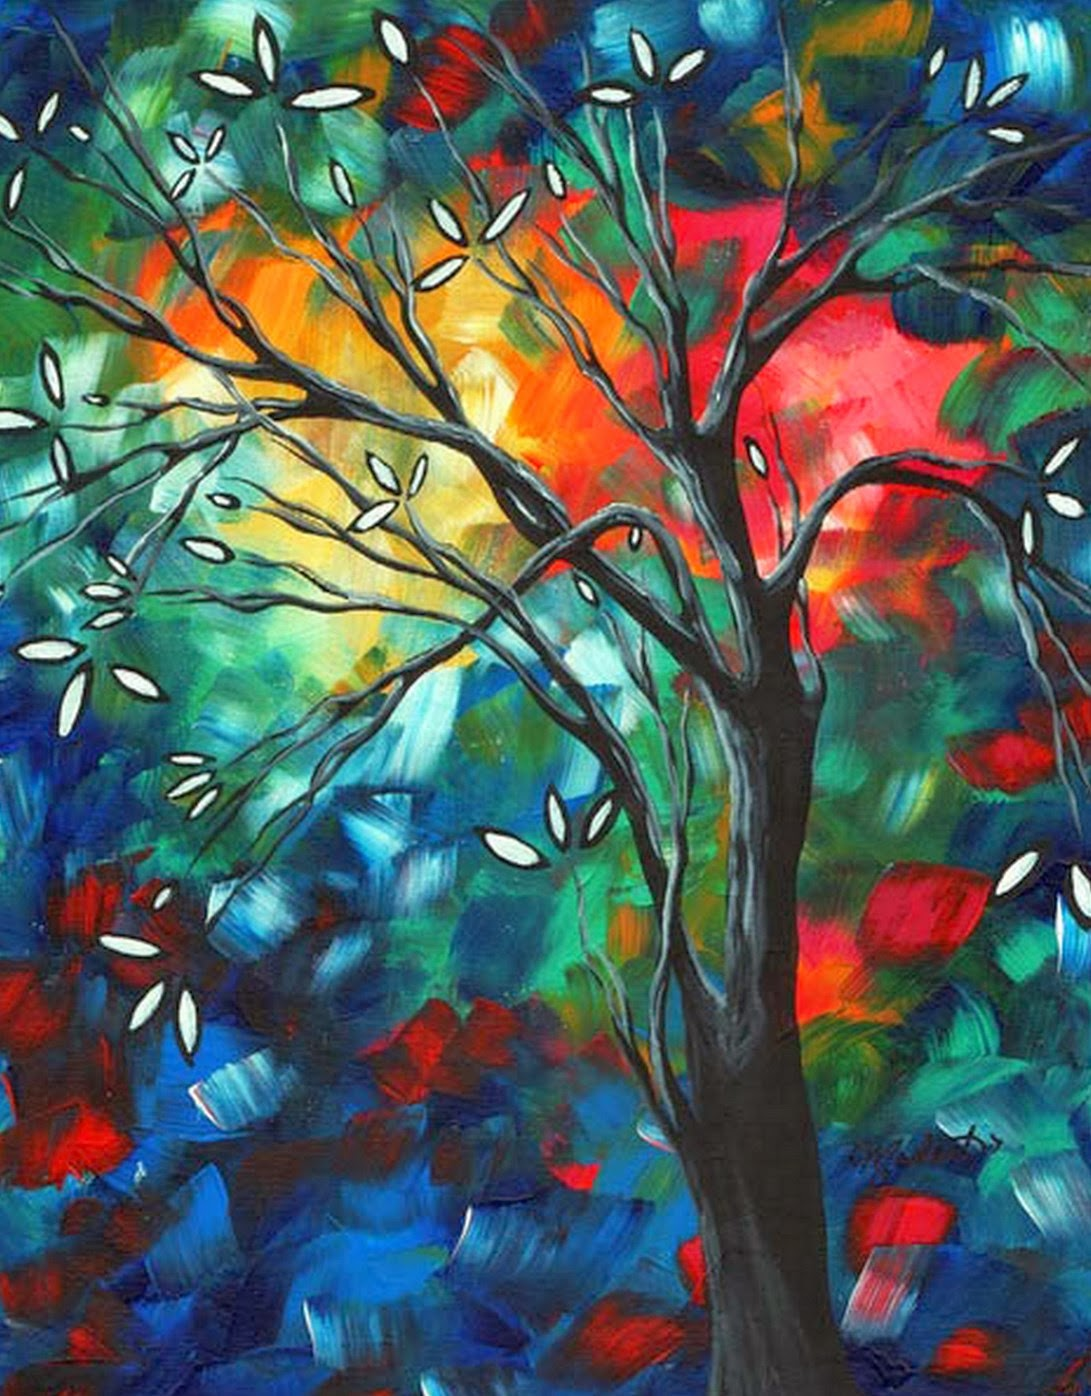 Cuadros modernos pinturas y dibujos abstractos - Fotos cuadros modernos ...